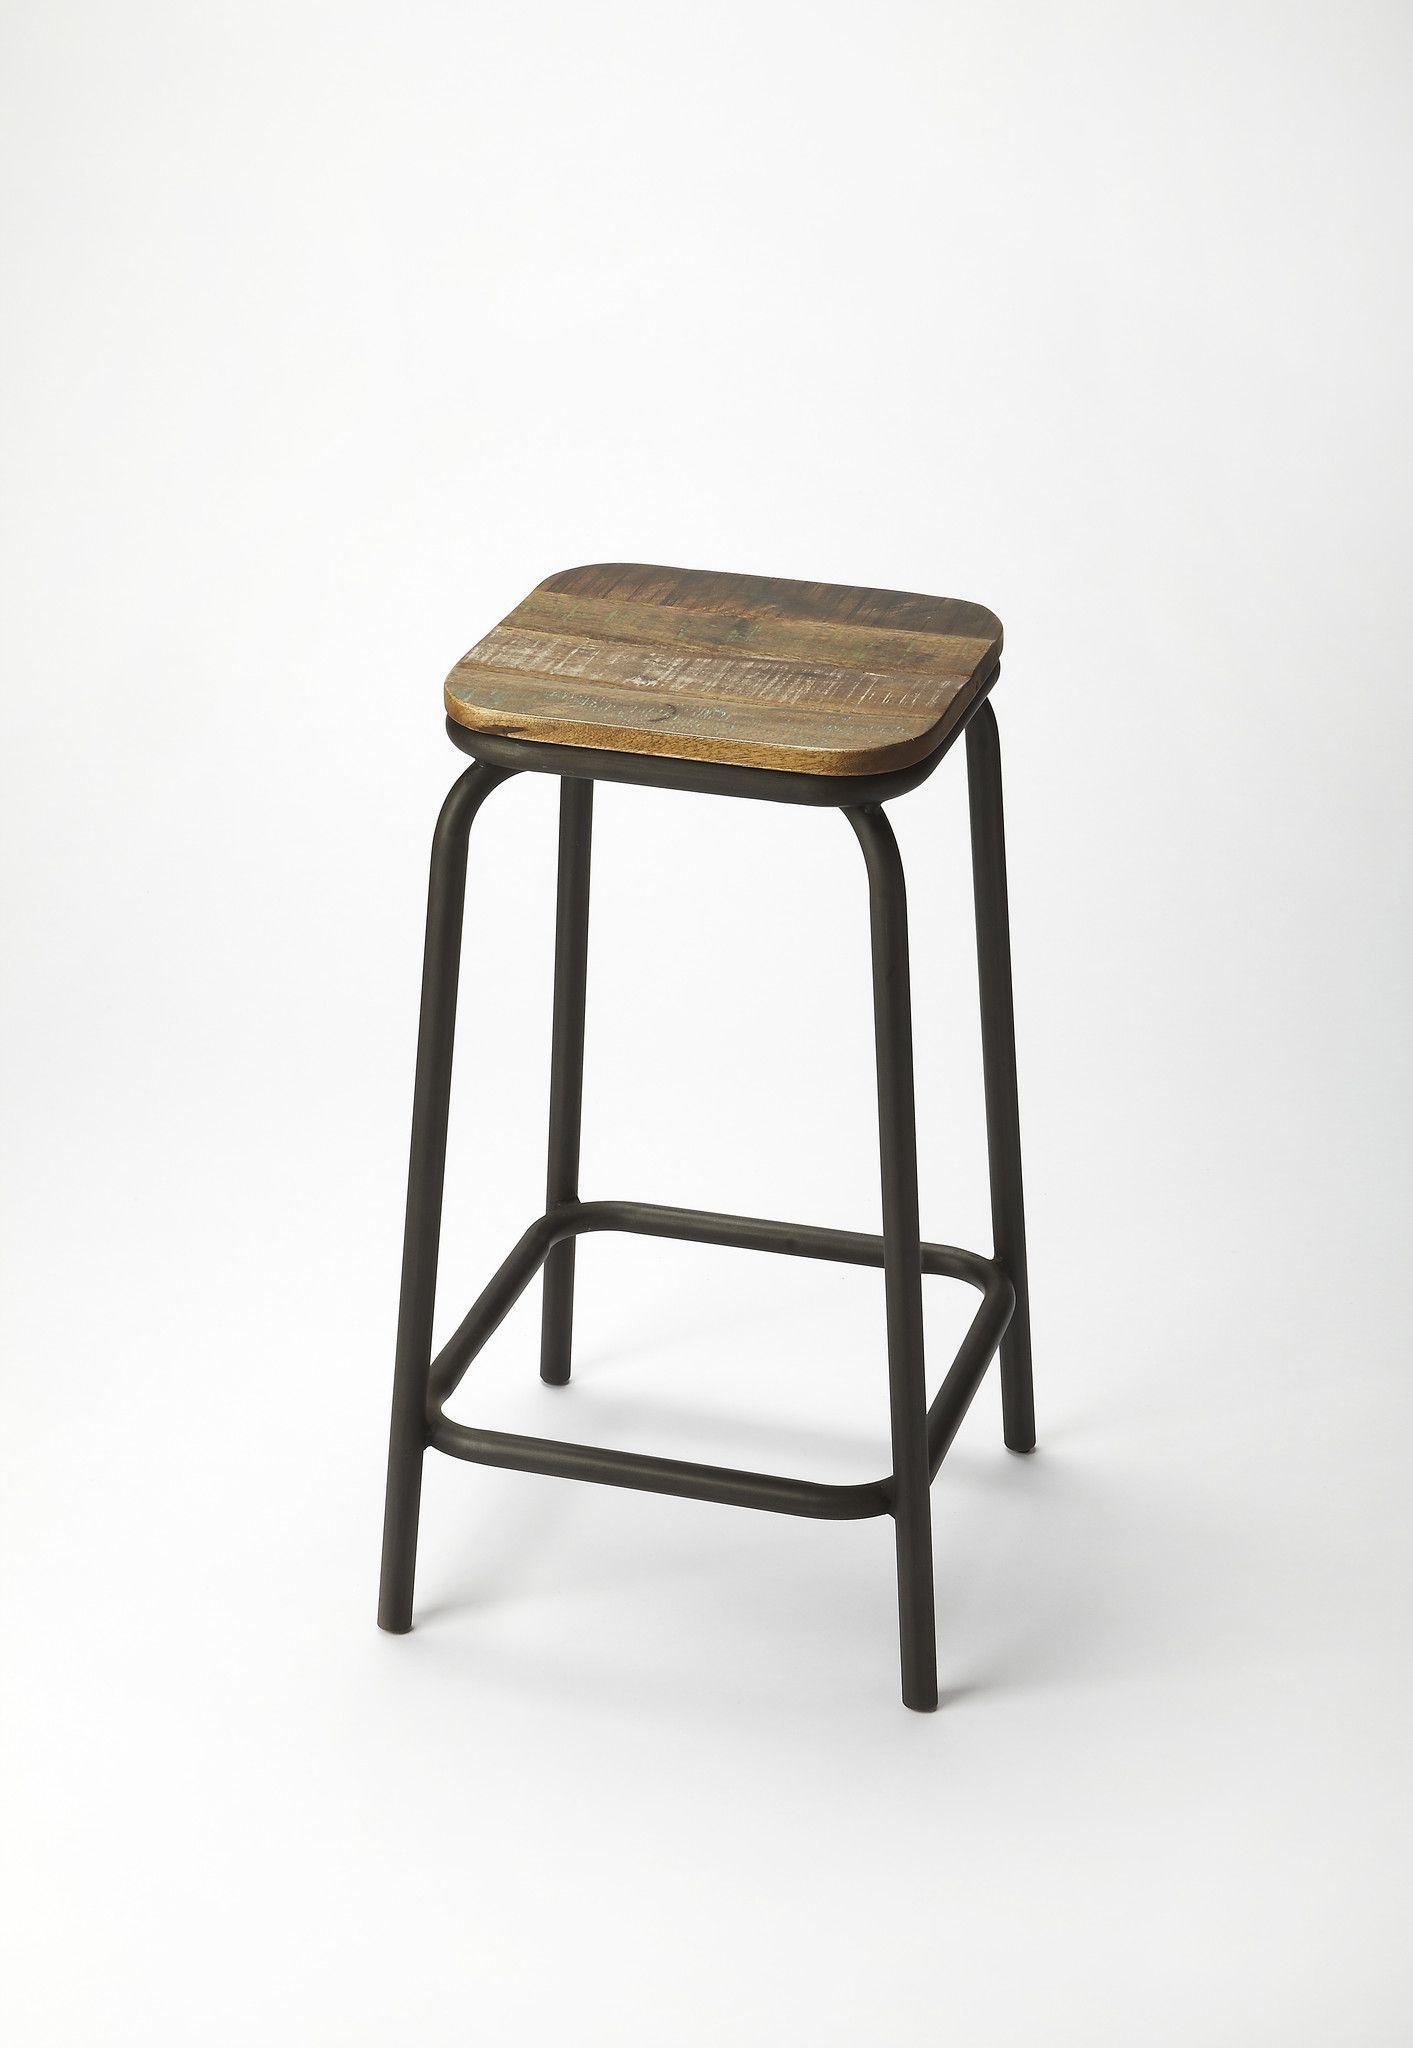 50+ Bar stools for sale ideas